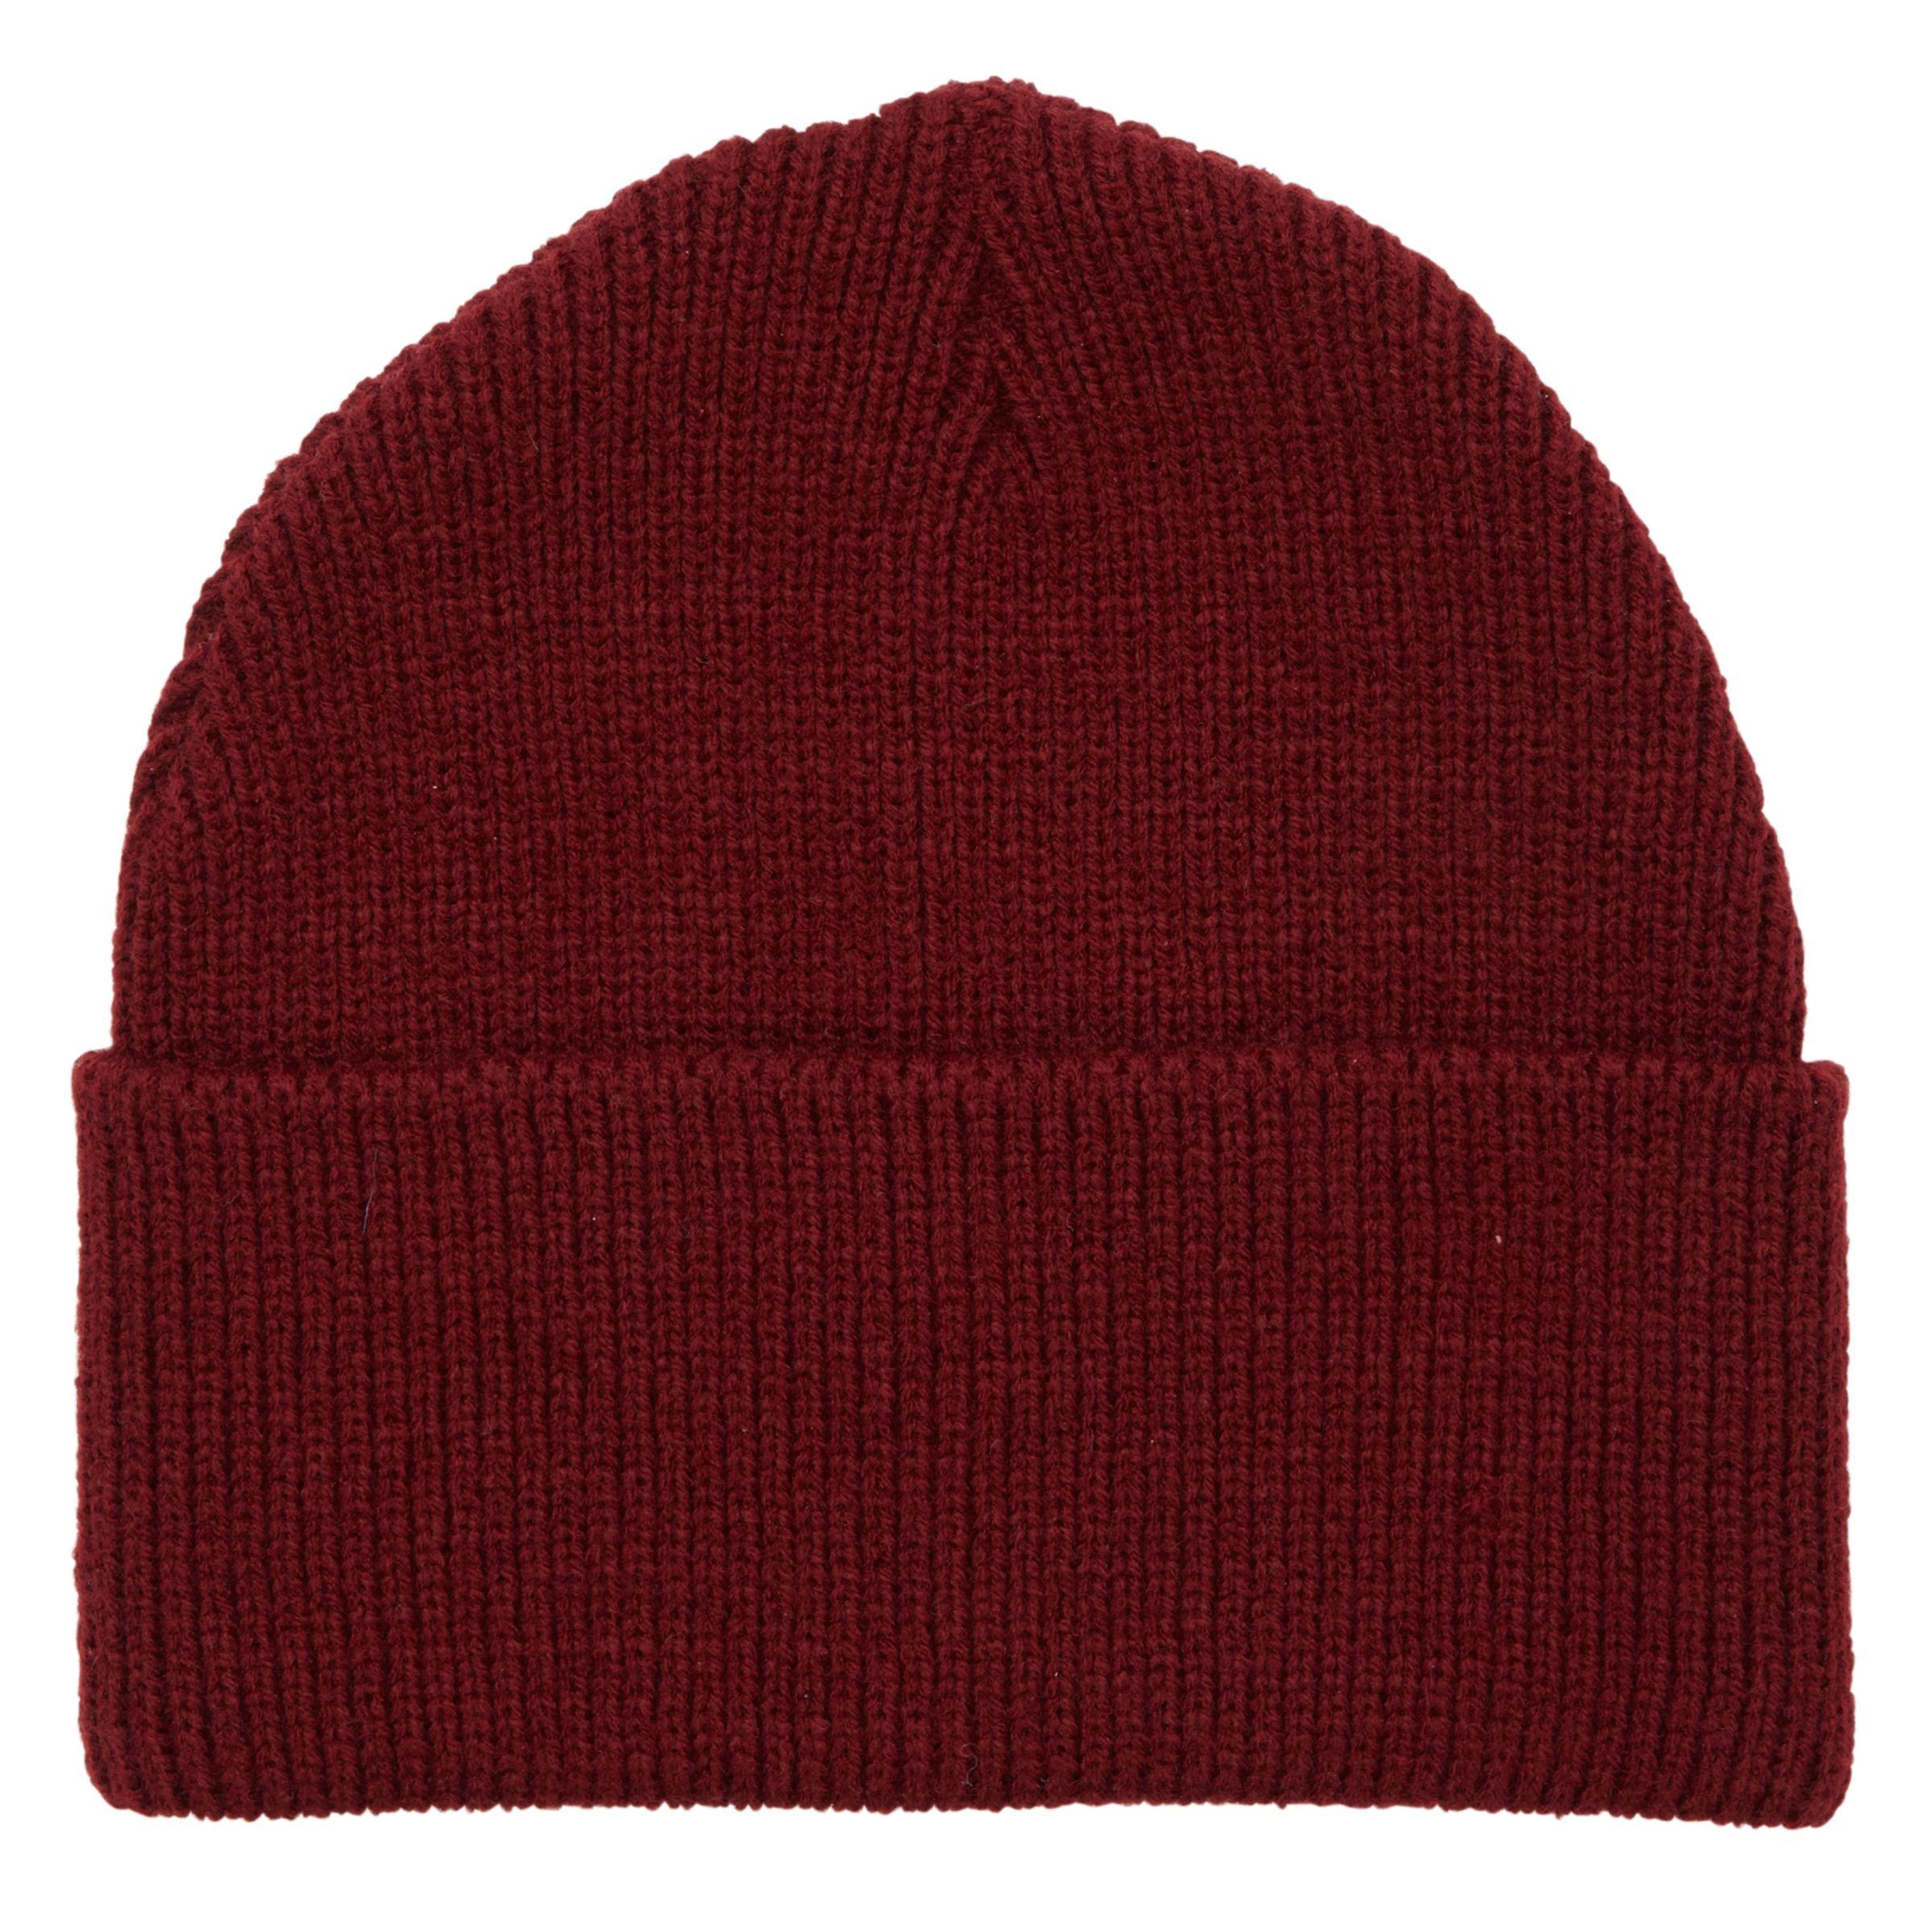 014fdfa3617 Tockington Manor School Unisex Ski Hat at John Lewis   Partners